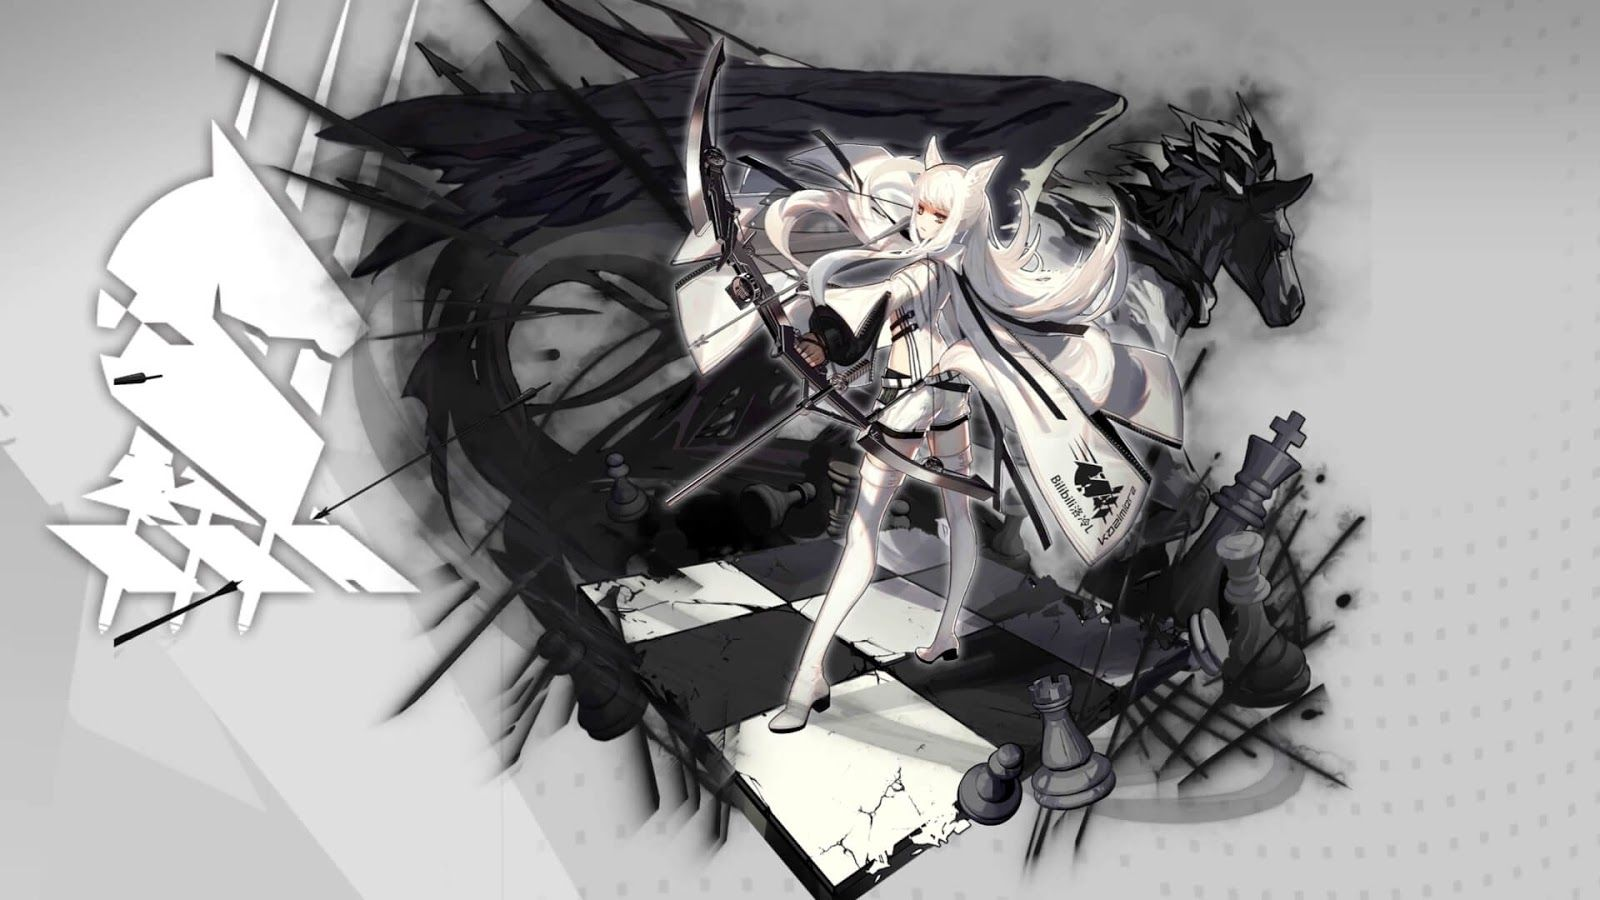 Platinum 白金 1080p 60fps Tomorrow S Ark Arknights Wallpaper Engine Anime Anime Anime Wallpaper Wallpaper